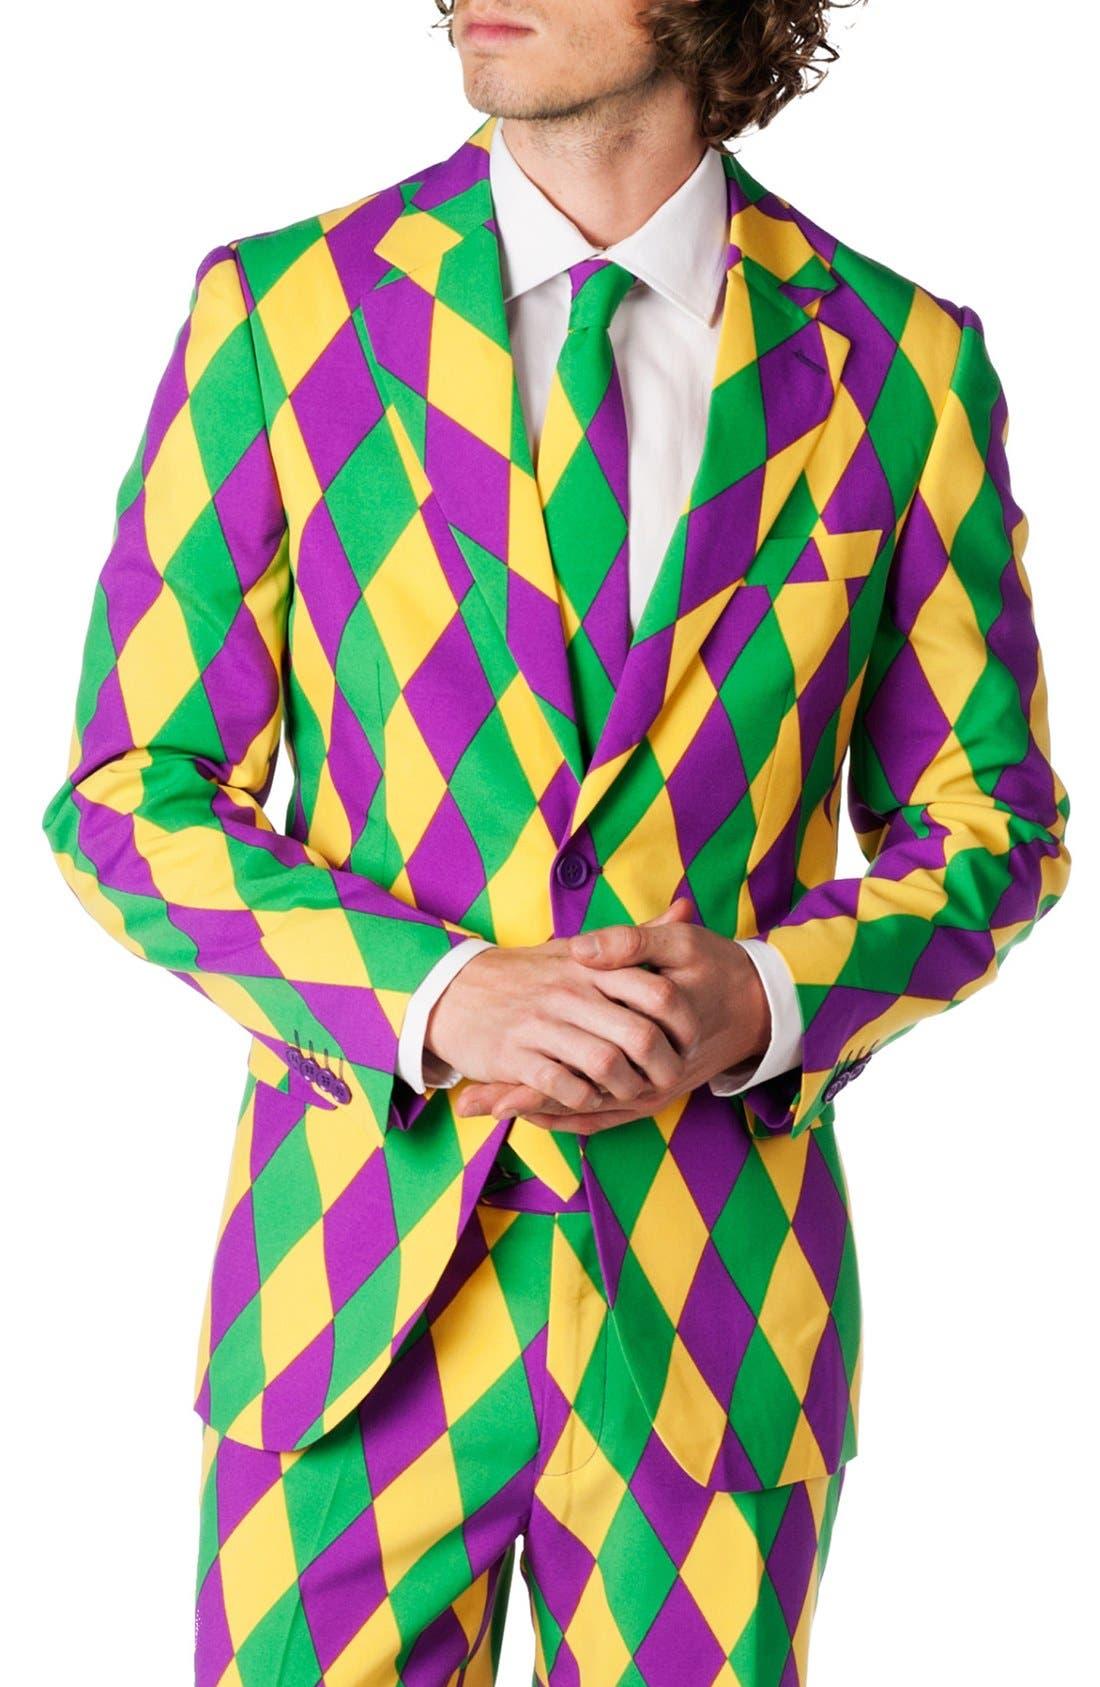 'Harleking' Trim Fit Suit with Tie,                             Alternate thumbnail 4, color,                             300